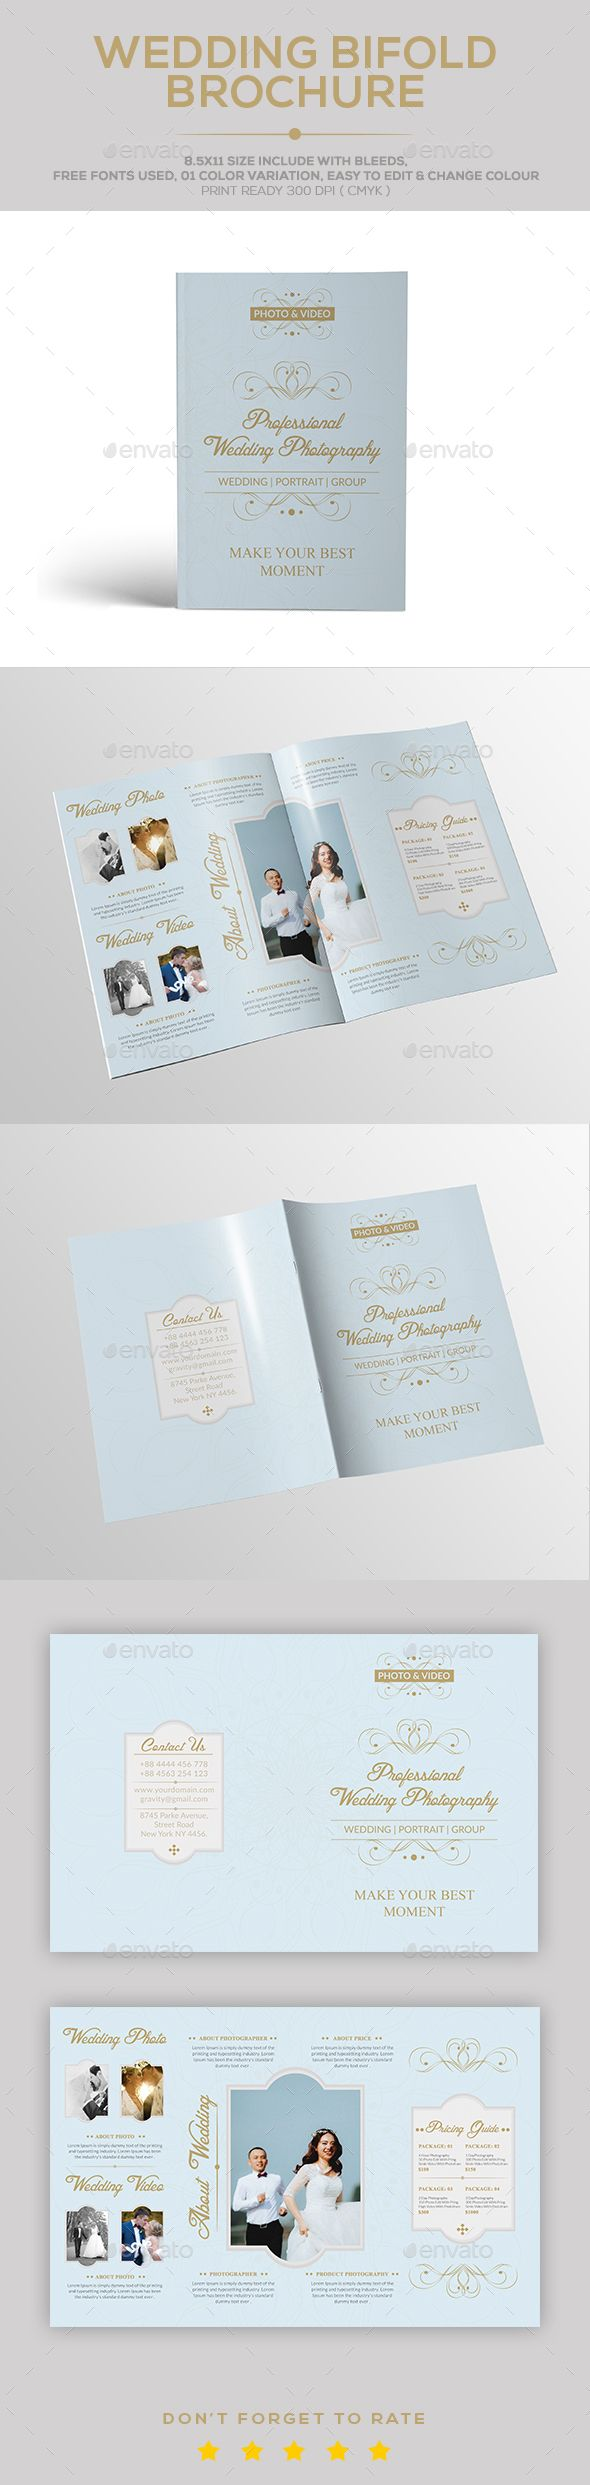 Free Wedding Brochures Demirediffusion